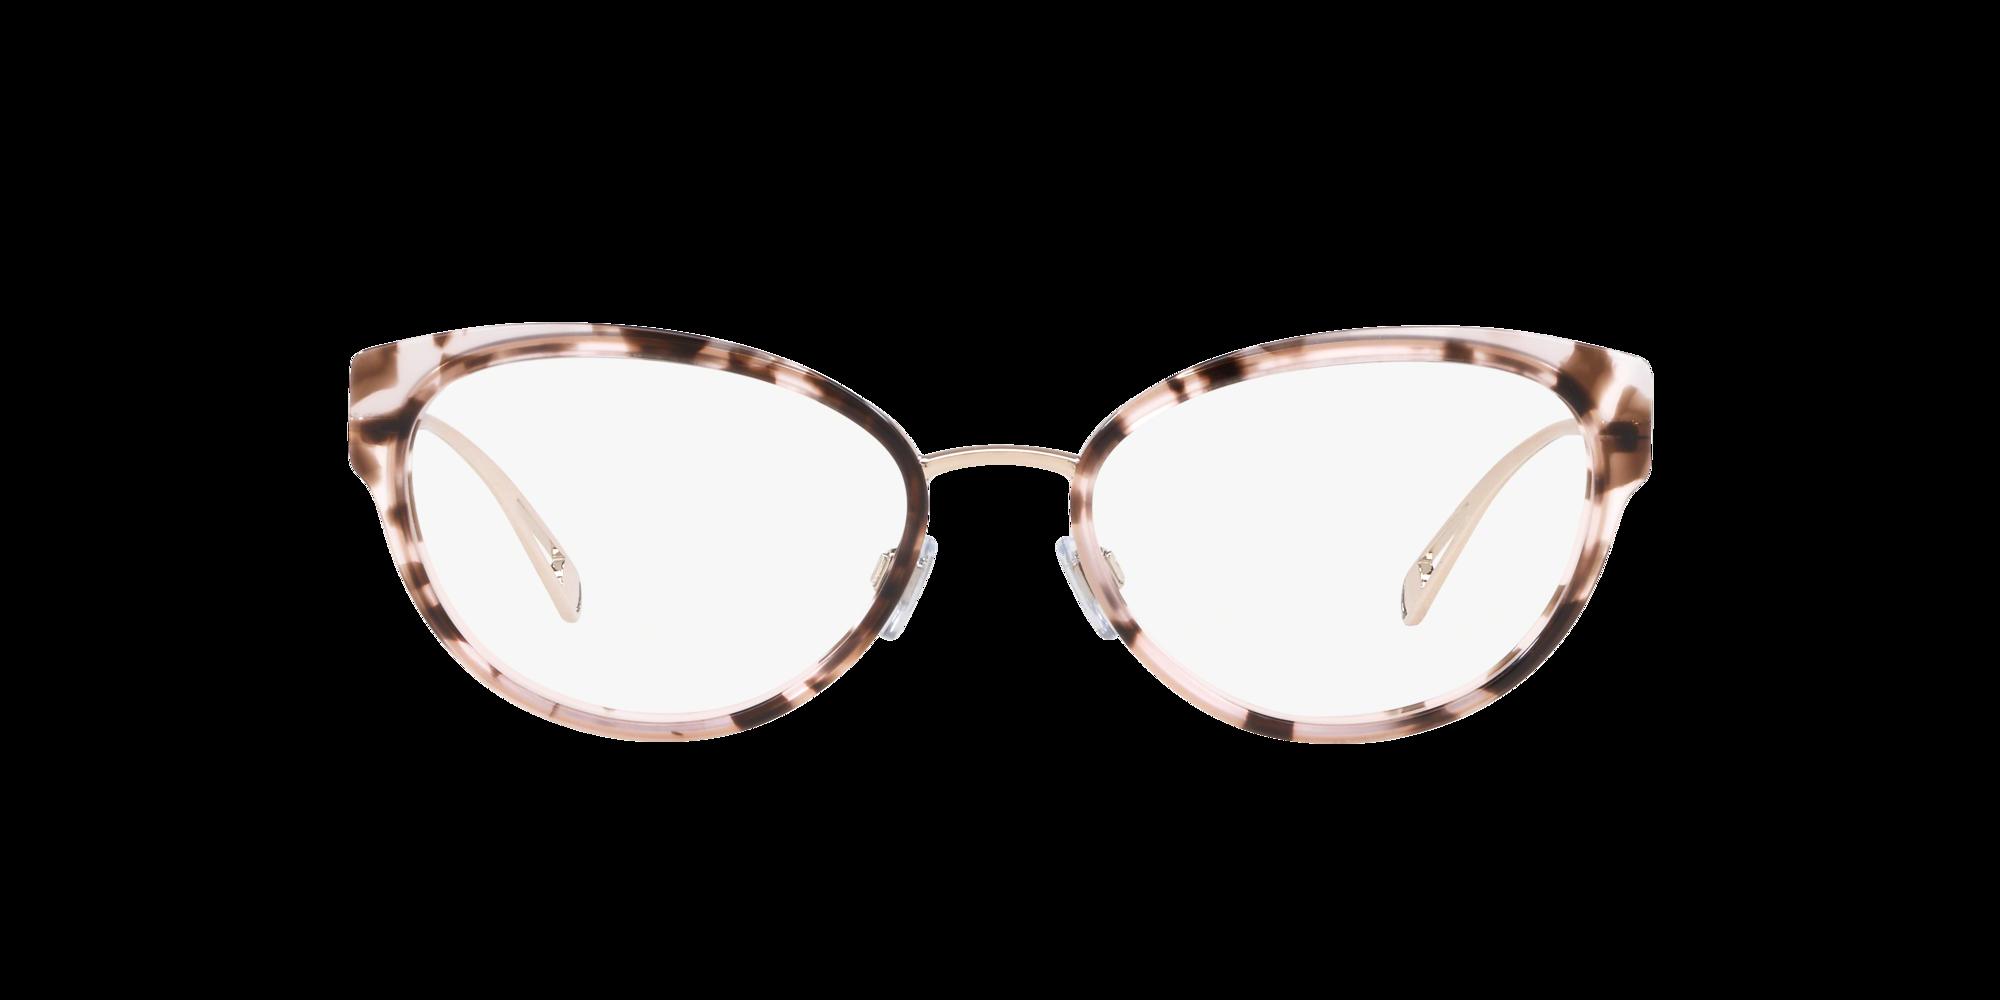 Image for AR5090 from LensCrafters   Glasses, Prescription Glasses Online, Eyewear